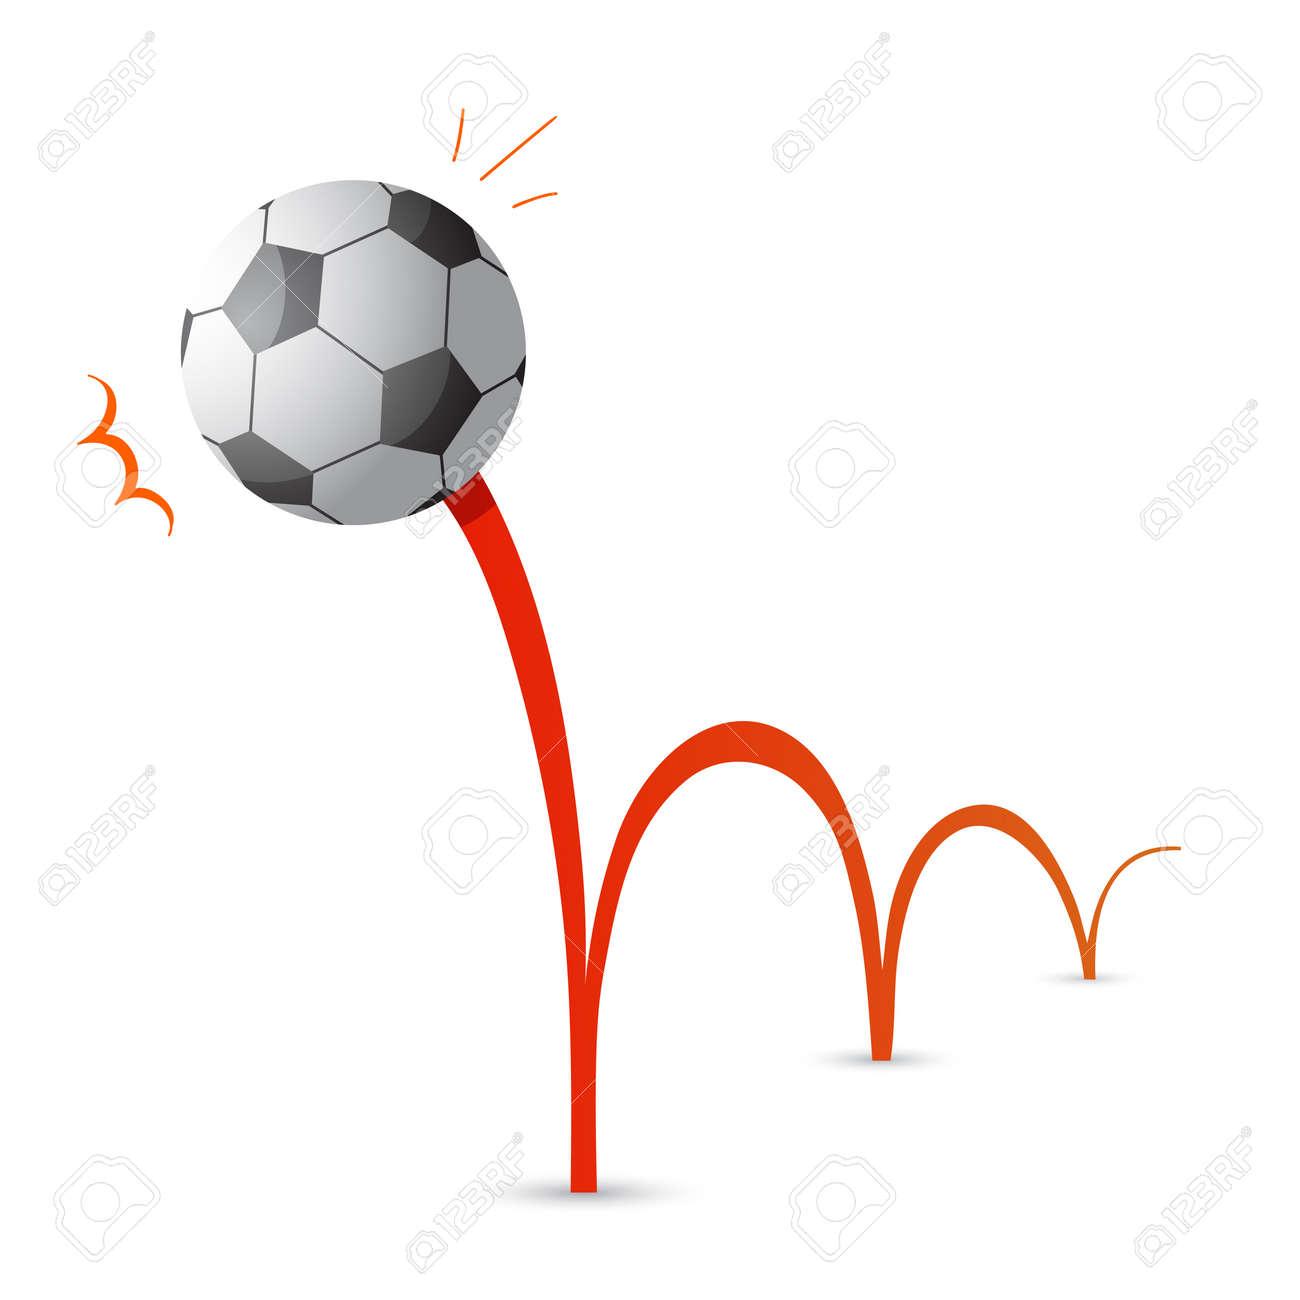 Bouncing soccer ball cartoon - 31363259